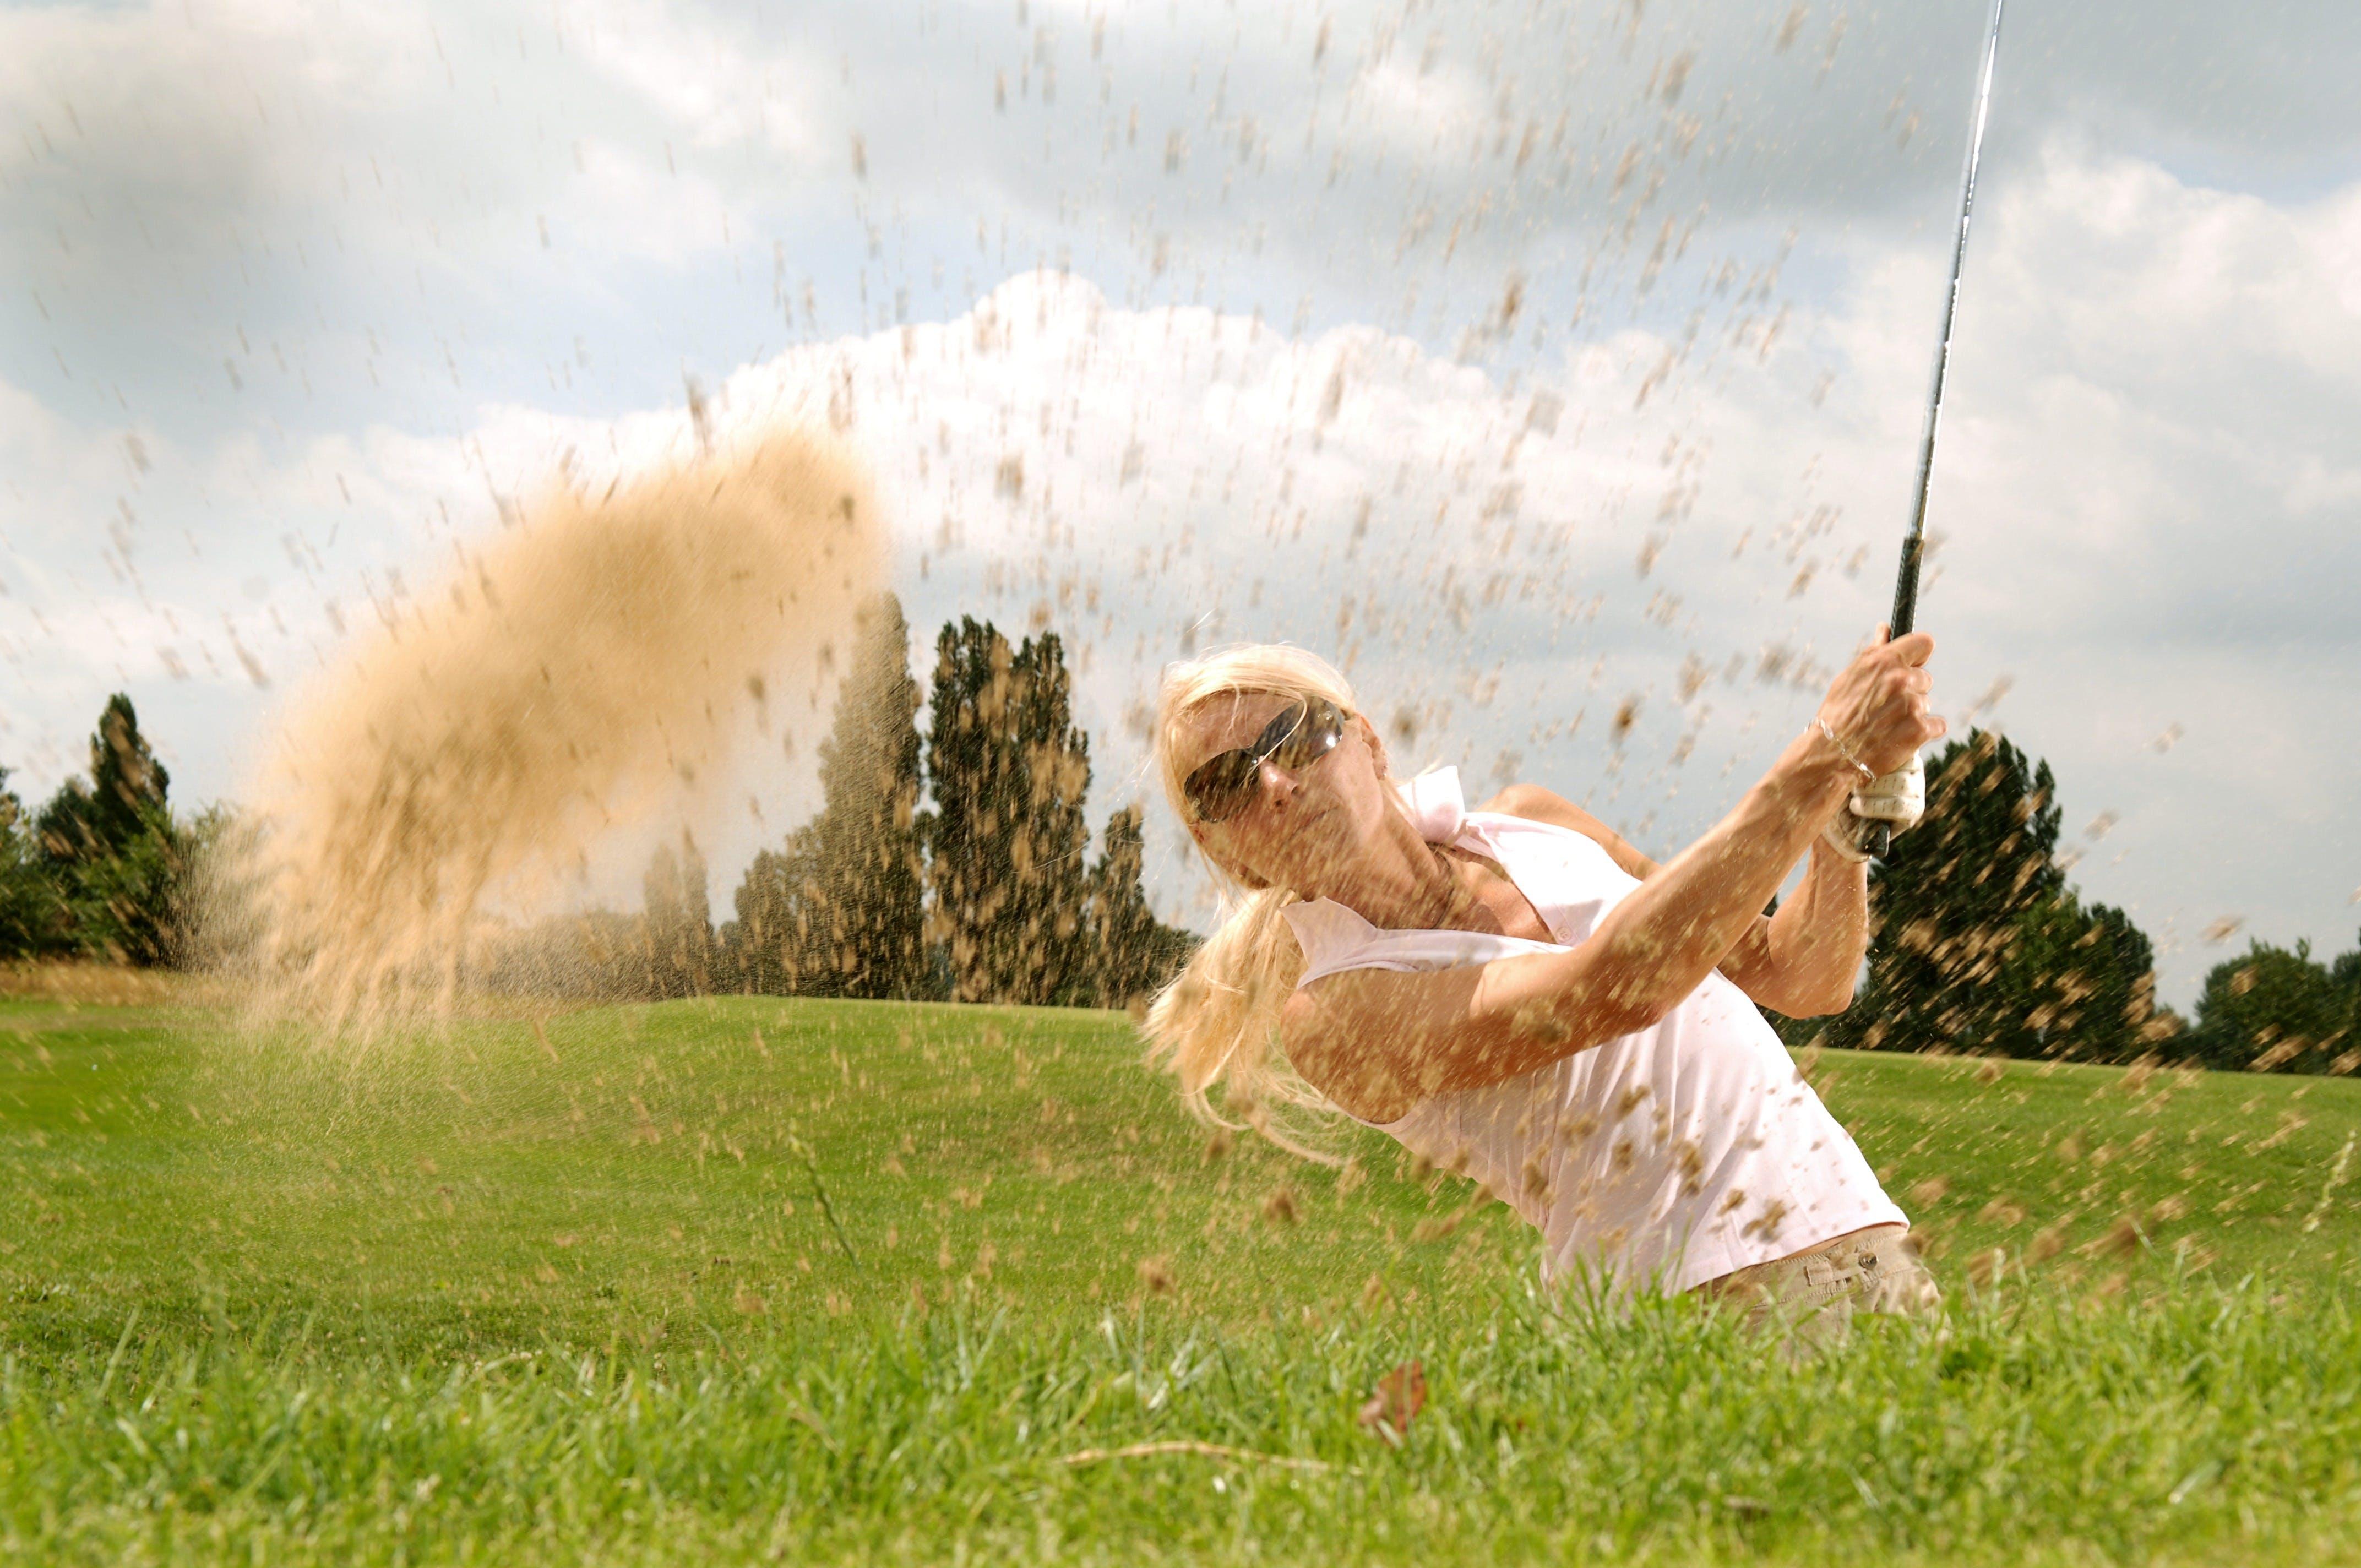 Woman Playing Golf during Daytime